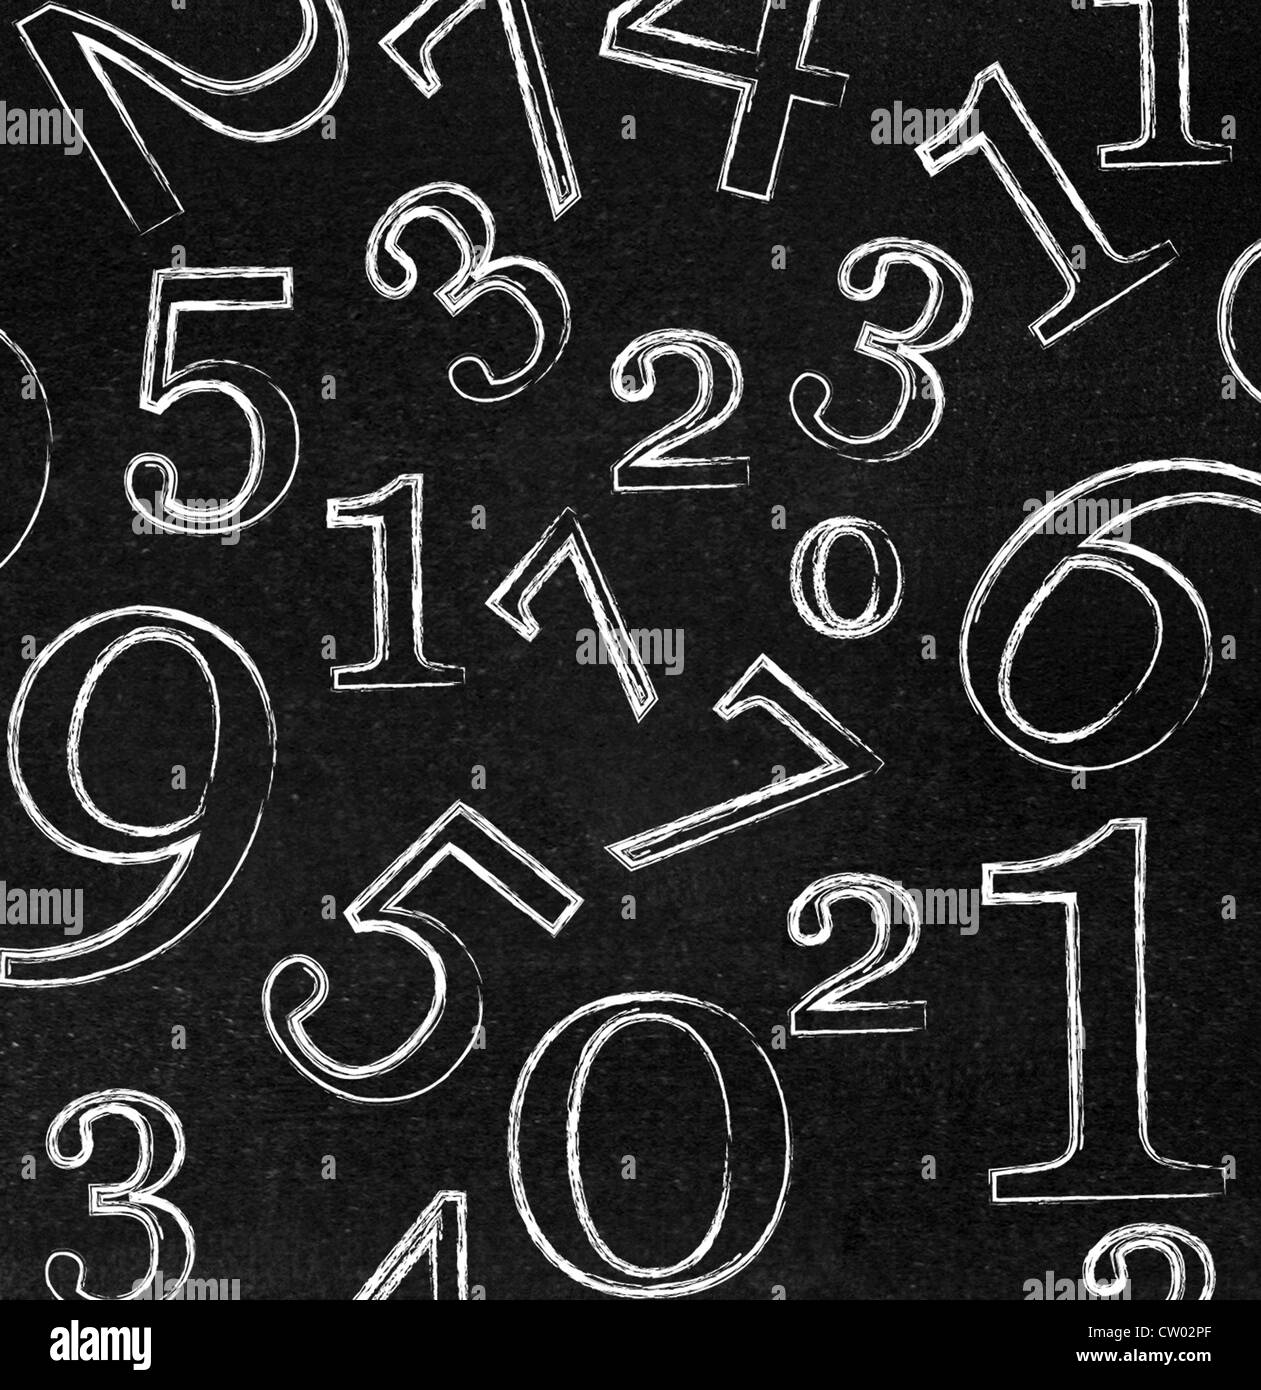 Numbers on blackboard - Stock Image